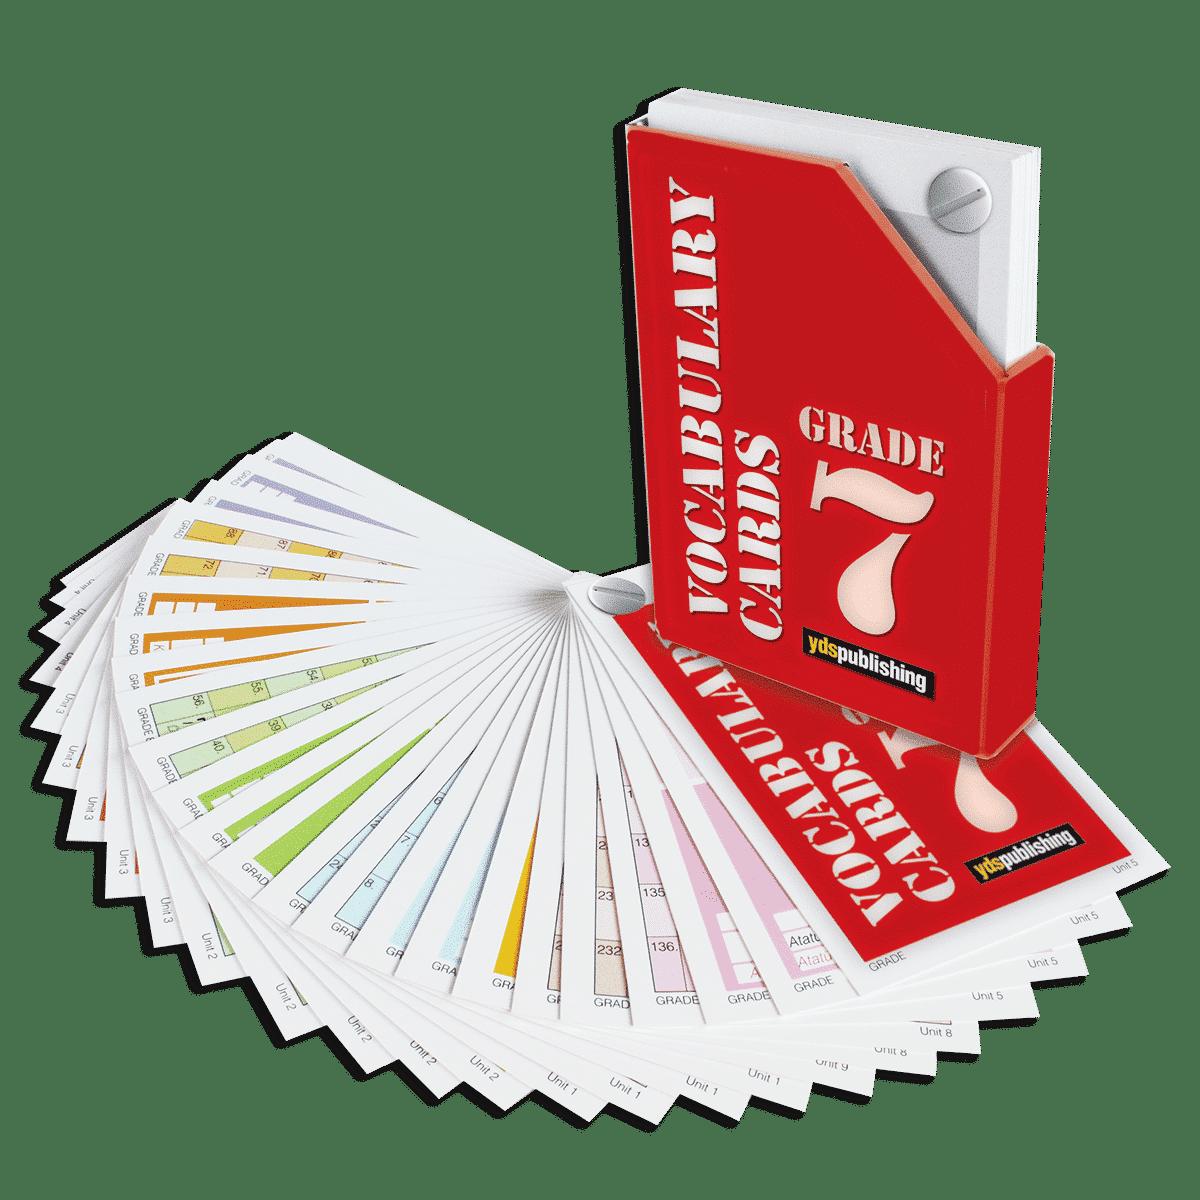 Grade 7 Vocabulary Cards grade 7 vocabulary cards -  Grade 7 Vocabulary Cards